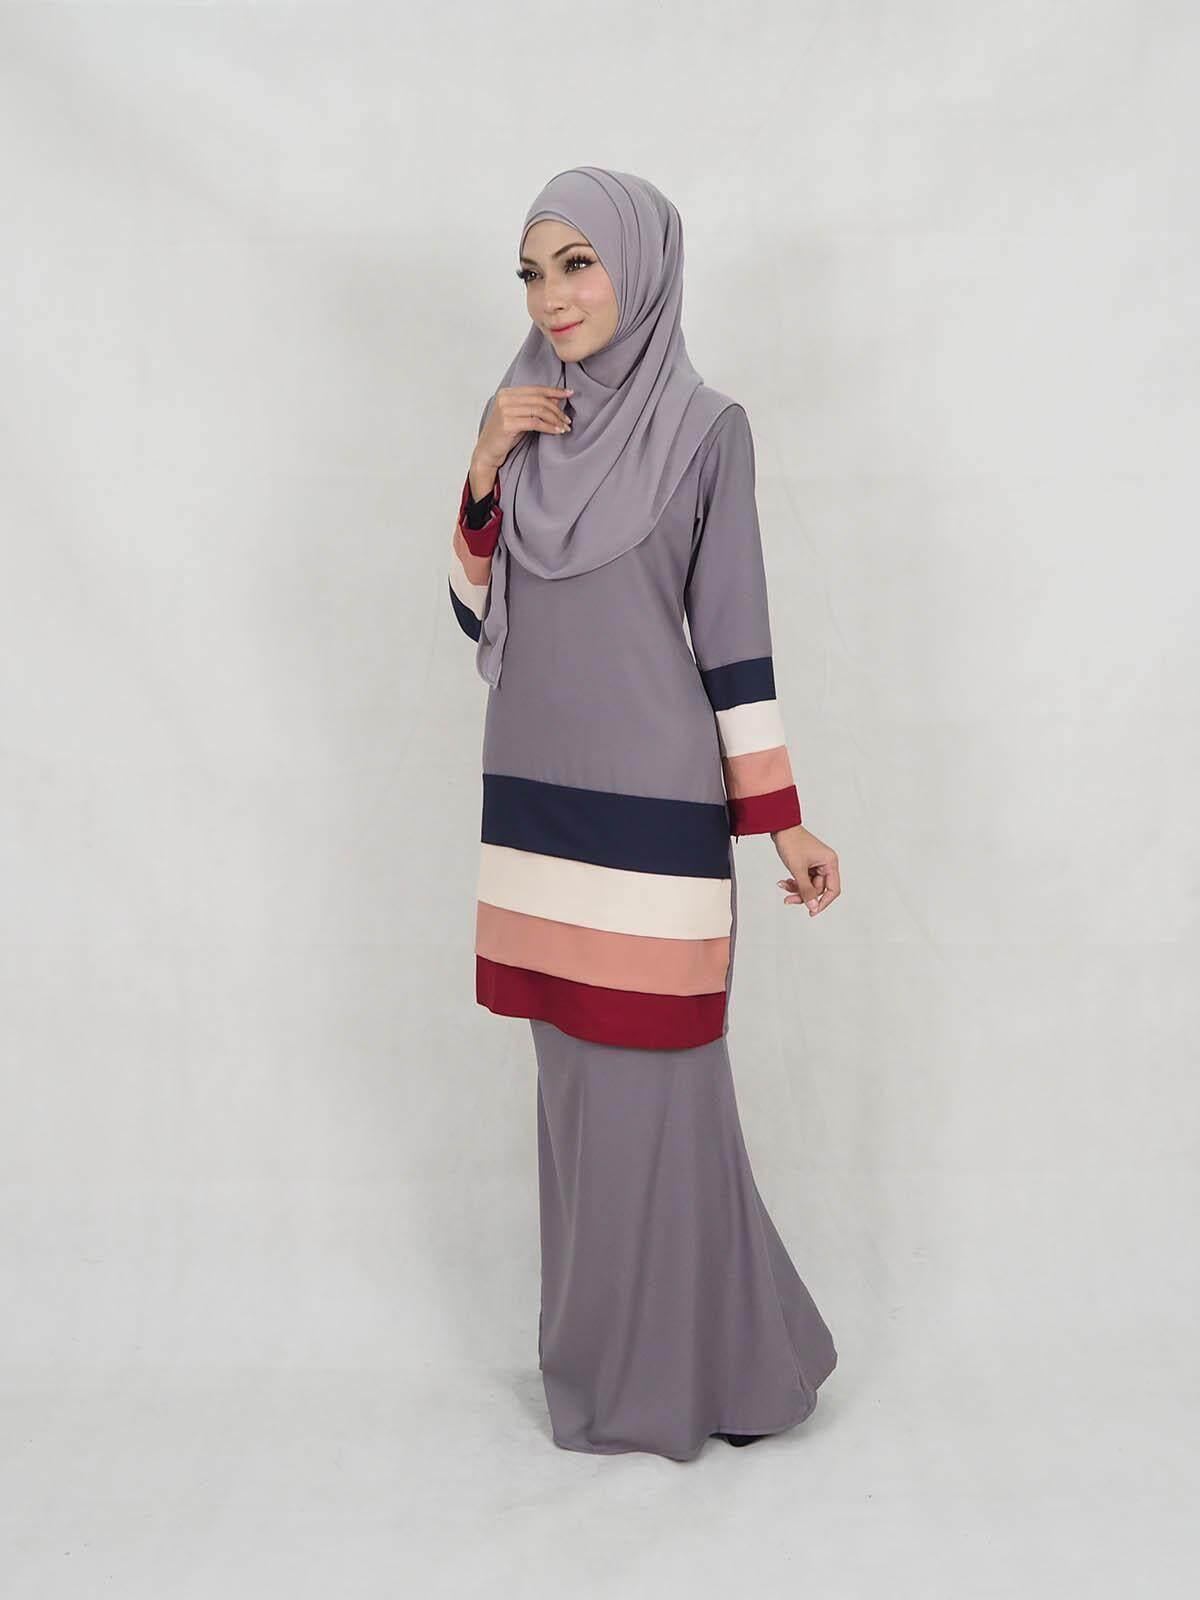 Kefli Colourful Baju Kurung / Muslimah Baju Kurung / Muslim Women Fashion Modern Baju Kurung (XXS-XL) / Women Dress Baju Raya Peplum Baju Kurung Moden 2019